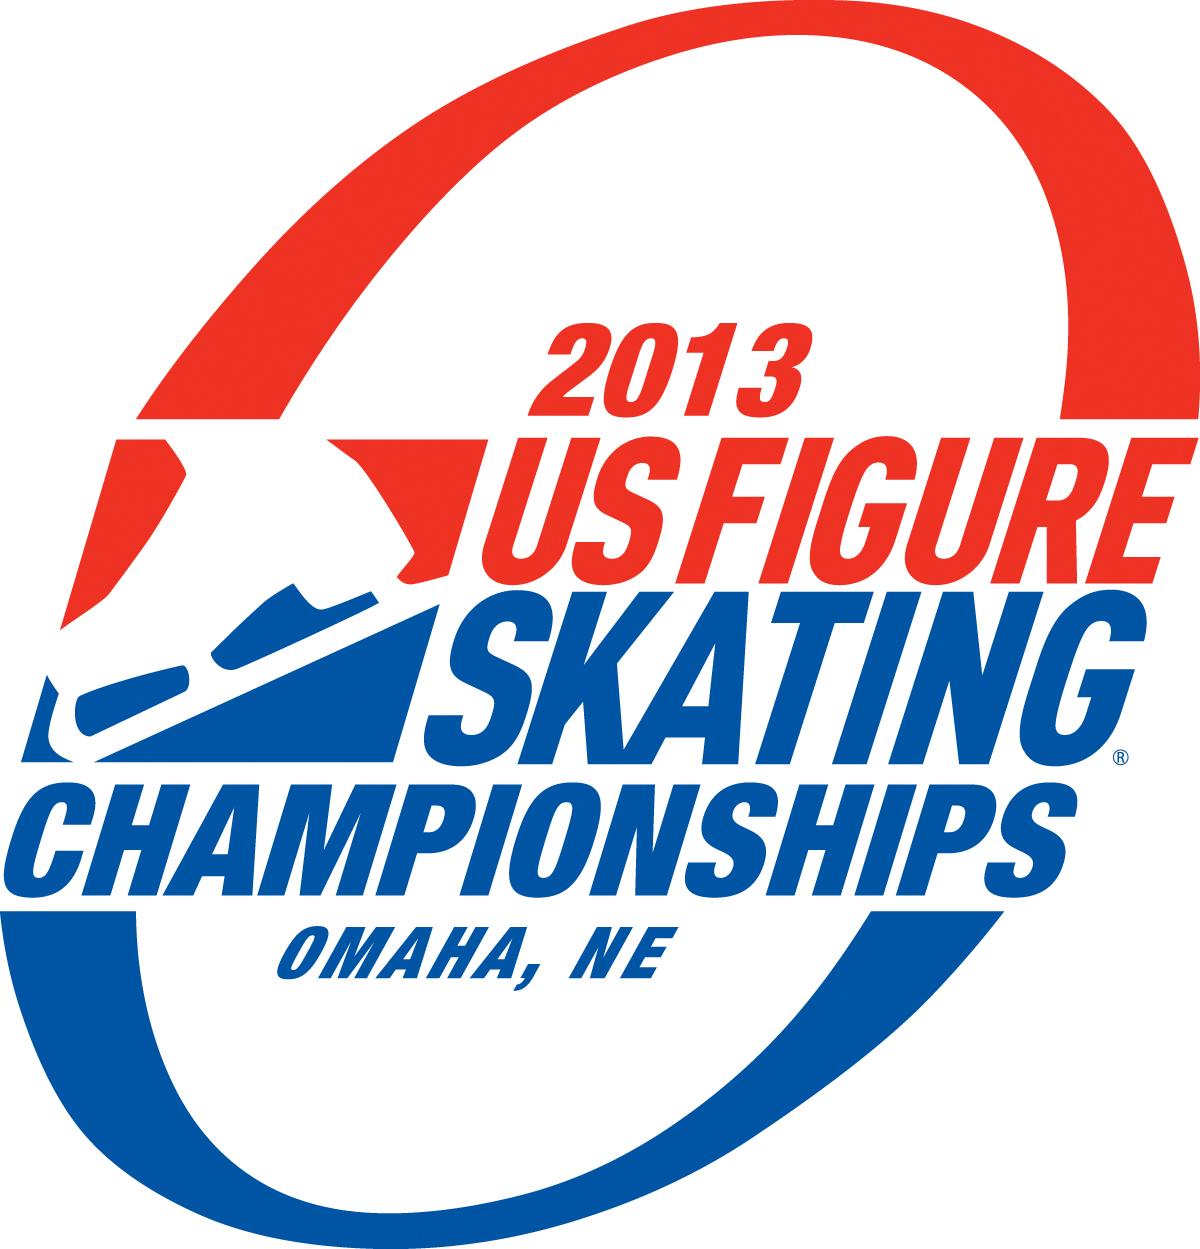 2013-us-championships-logo.jpg